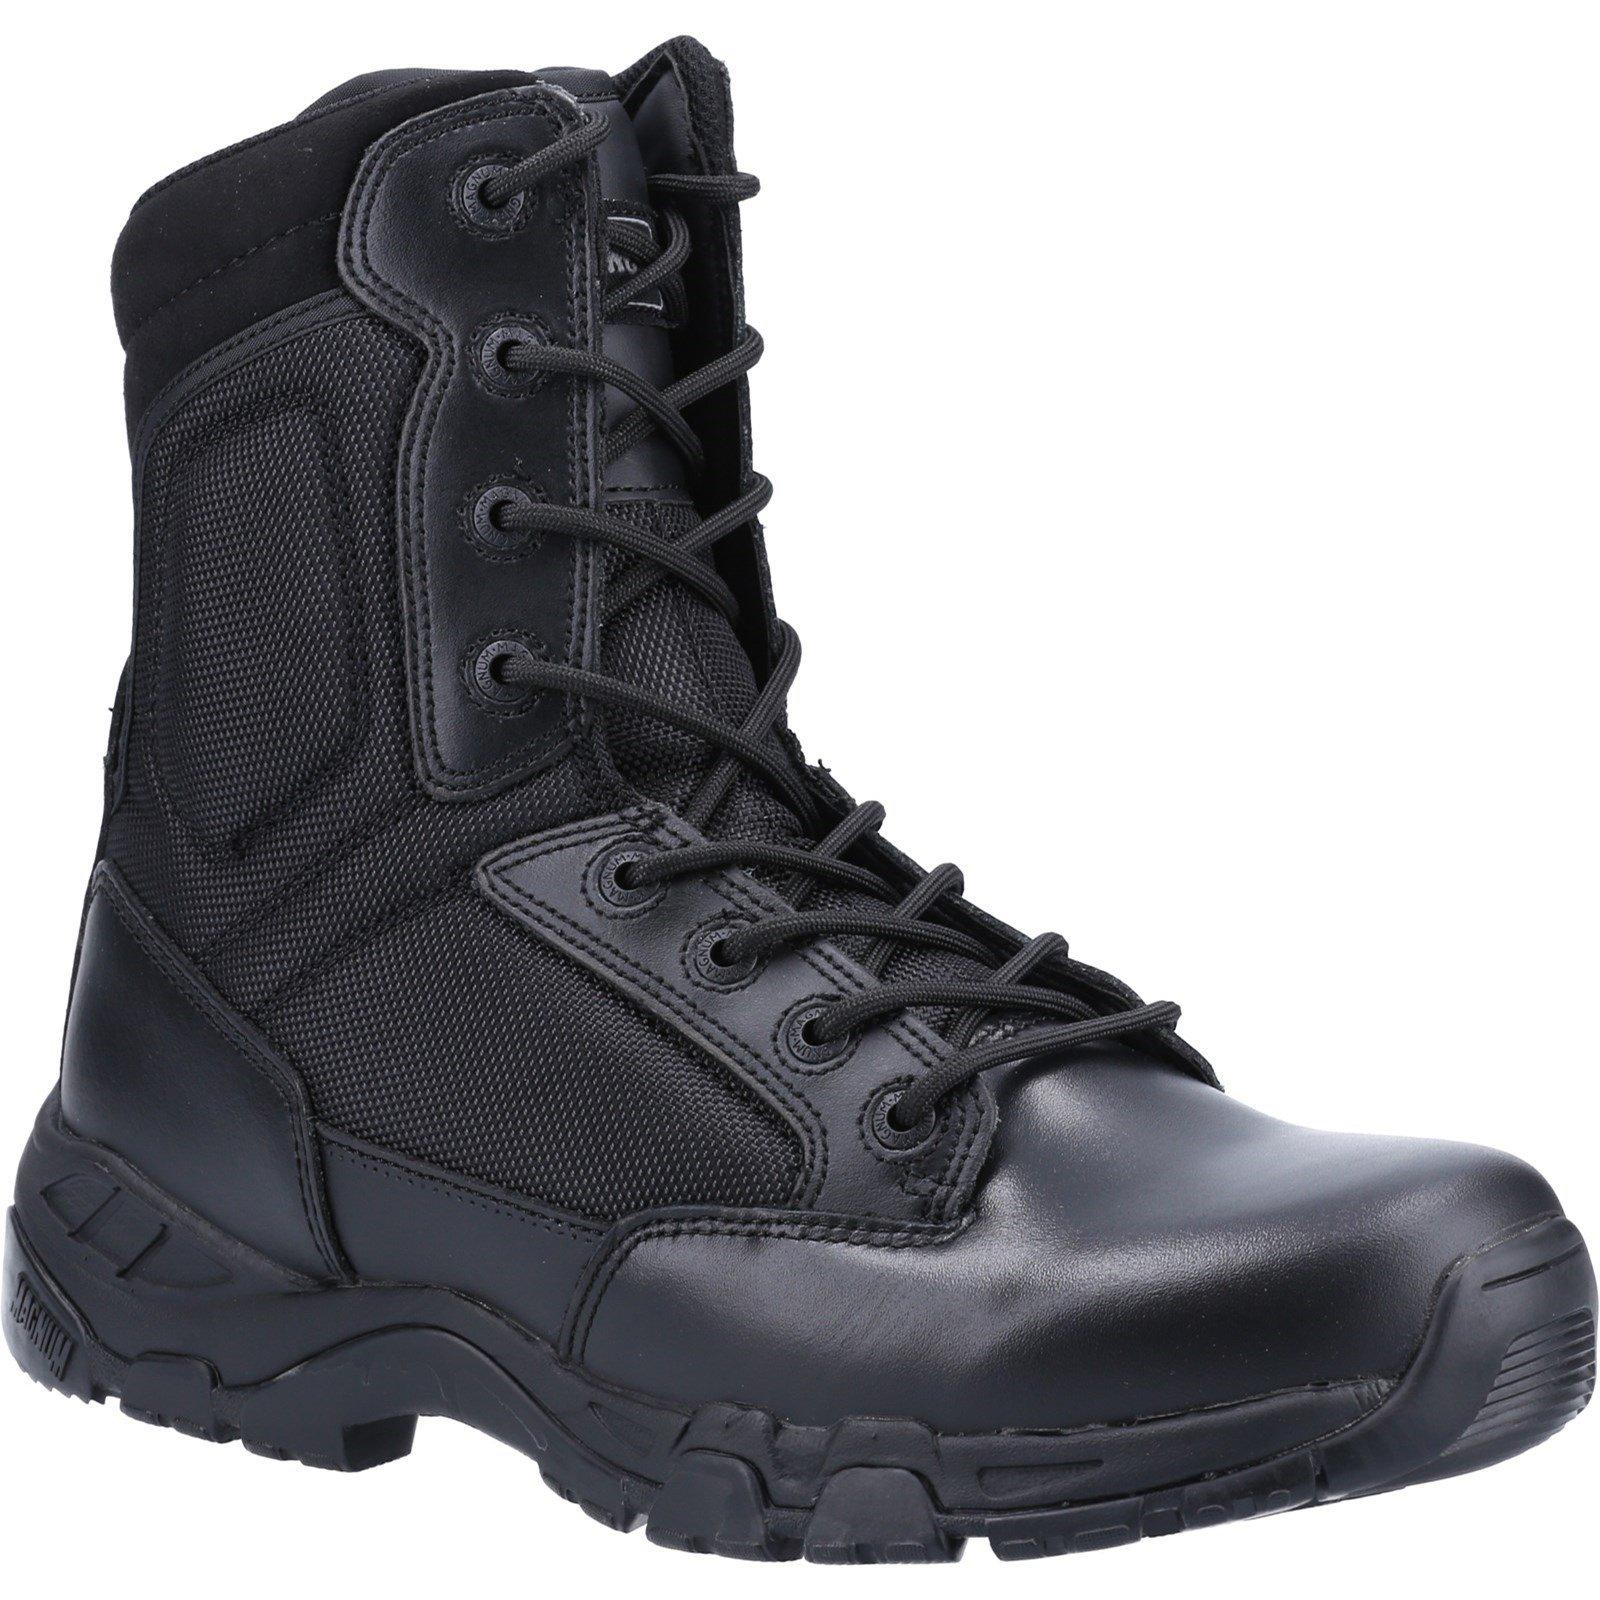 Magnum Unisex Viper Pro Plus Side-Zip Uniform Boot Black 33533 - Black 12